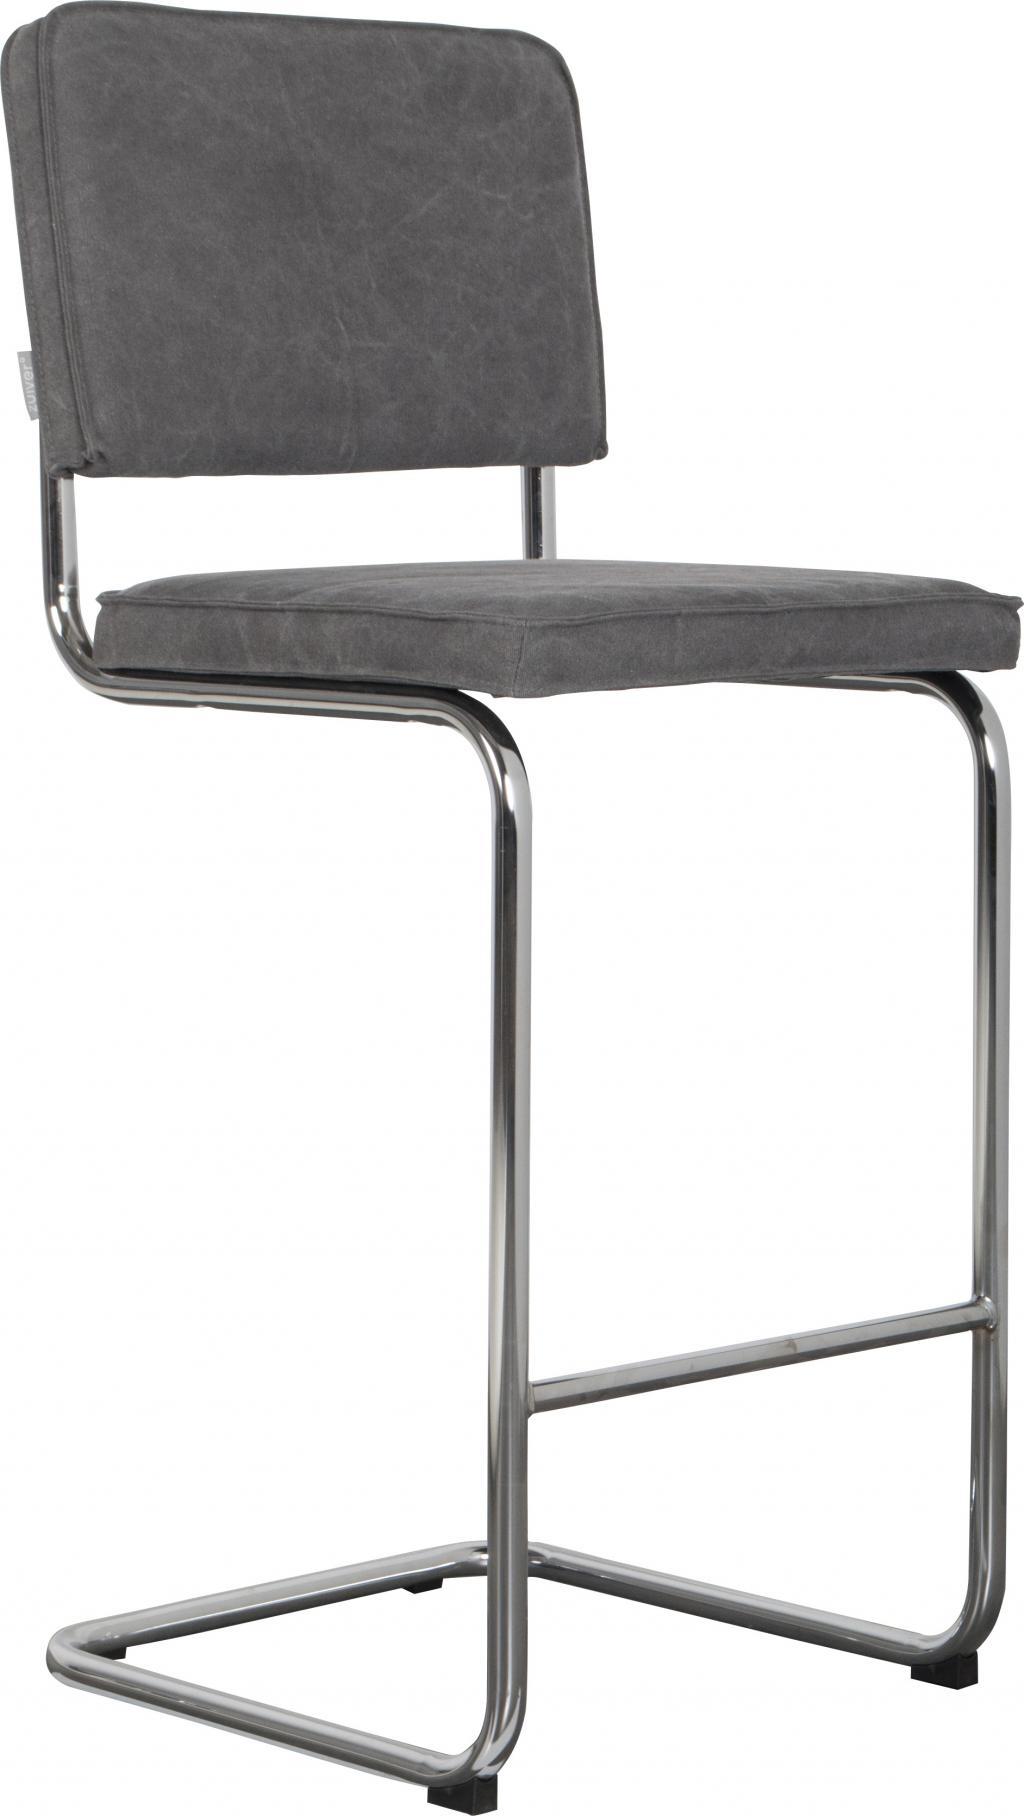 Hoker Ridge Vintage Grey - 1500027